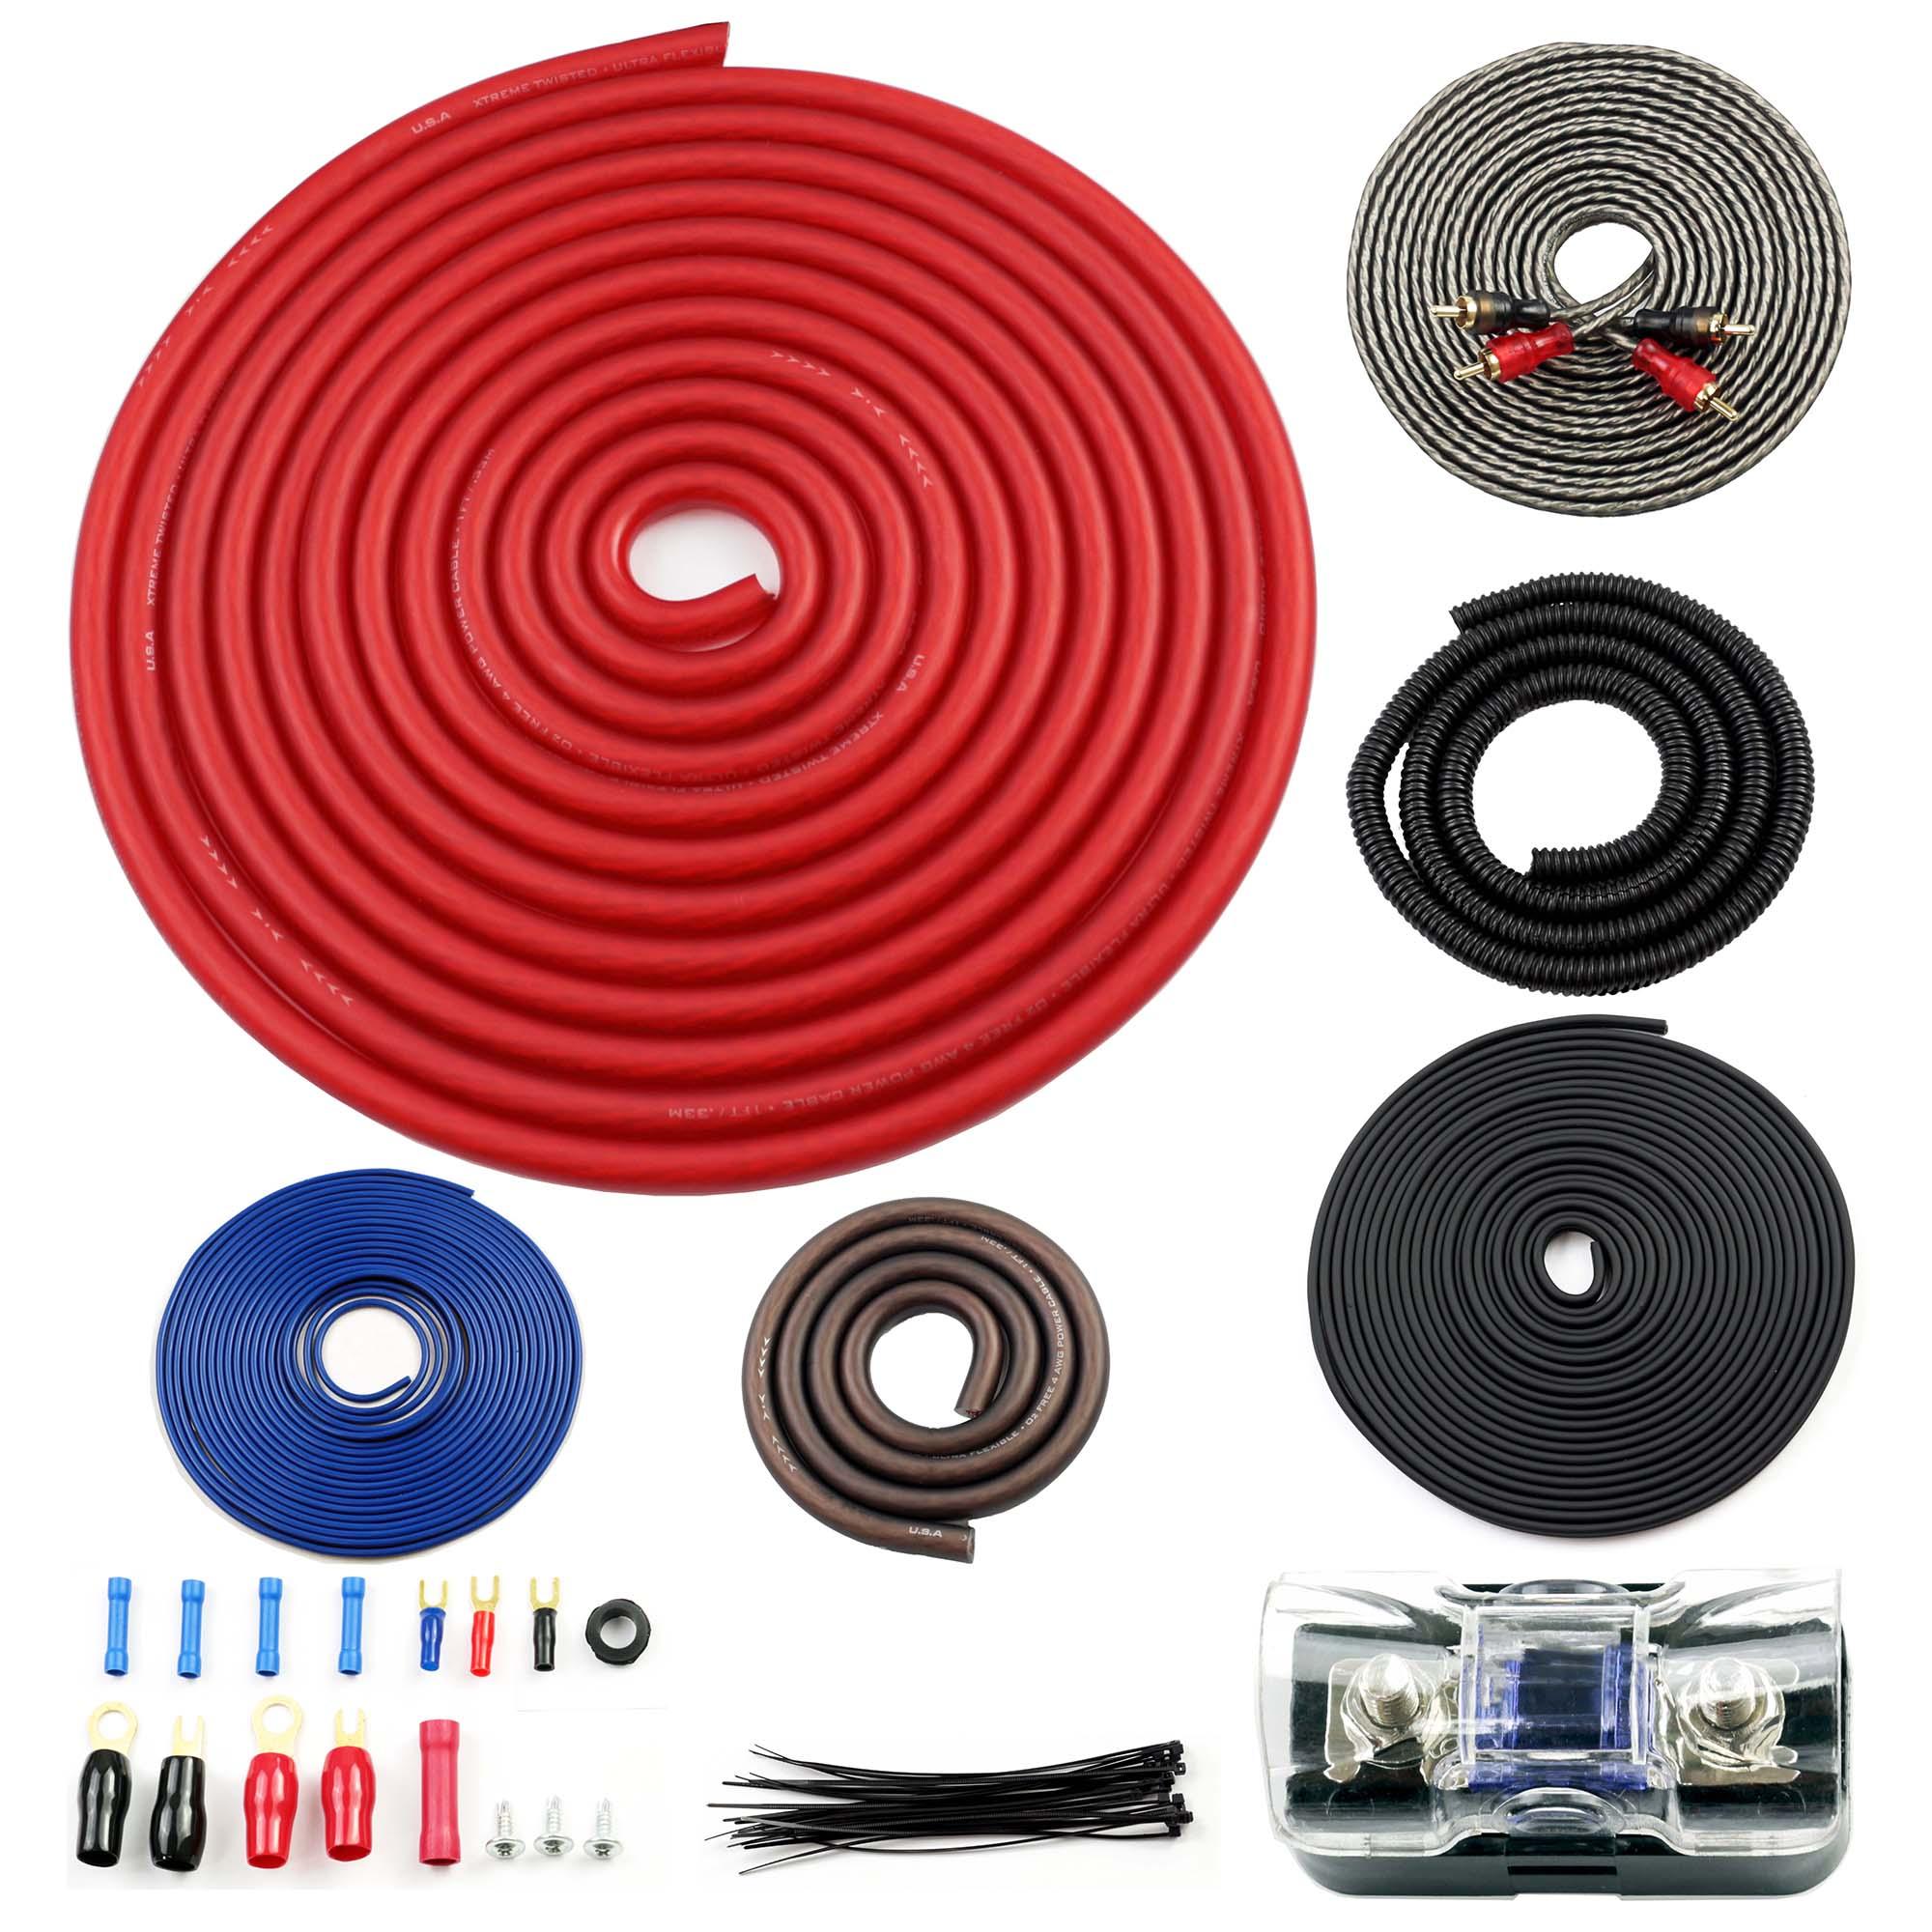 Bullz Audio 4 Gauge Car Amplifier Installation Power Wiring Kit, Red | BGE4RB